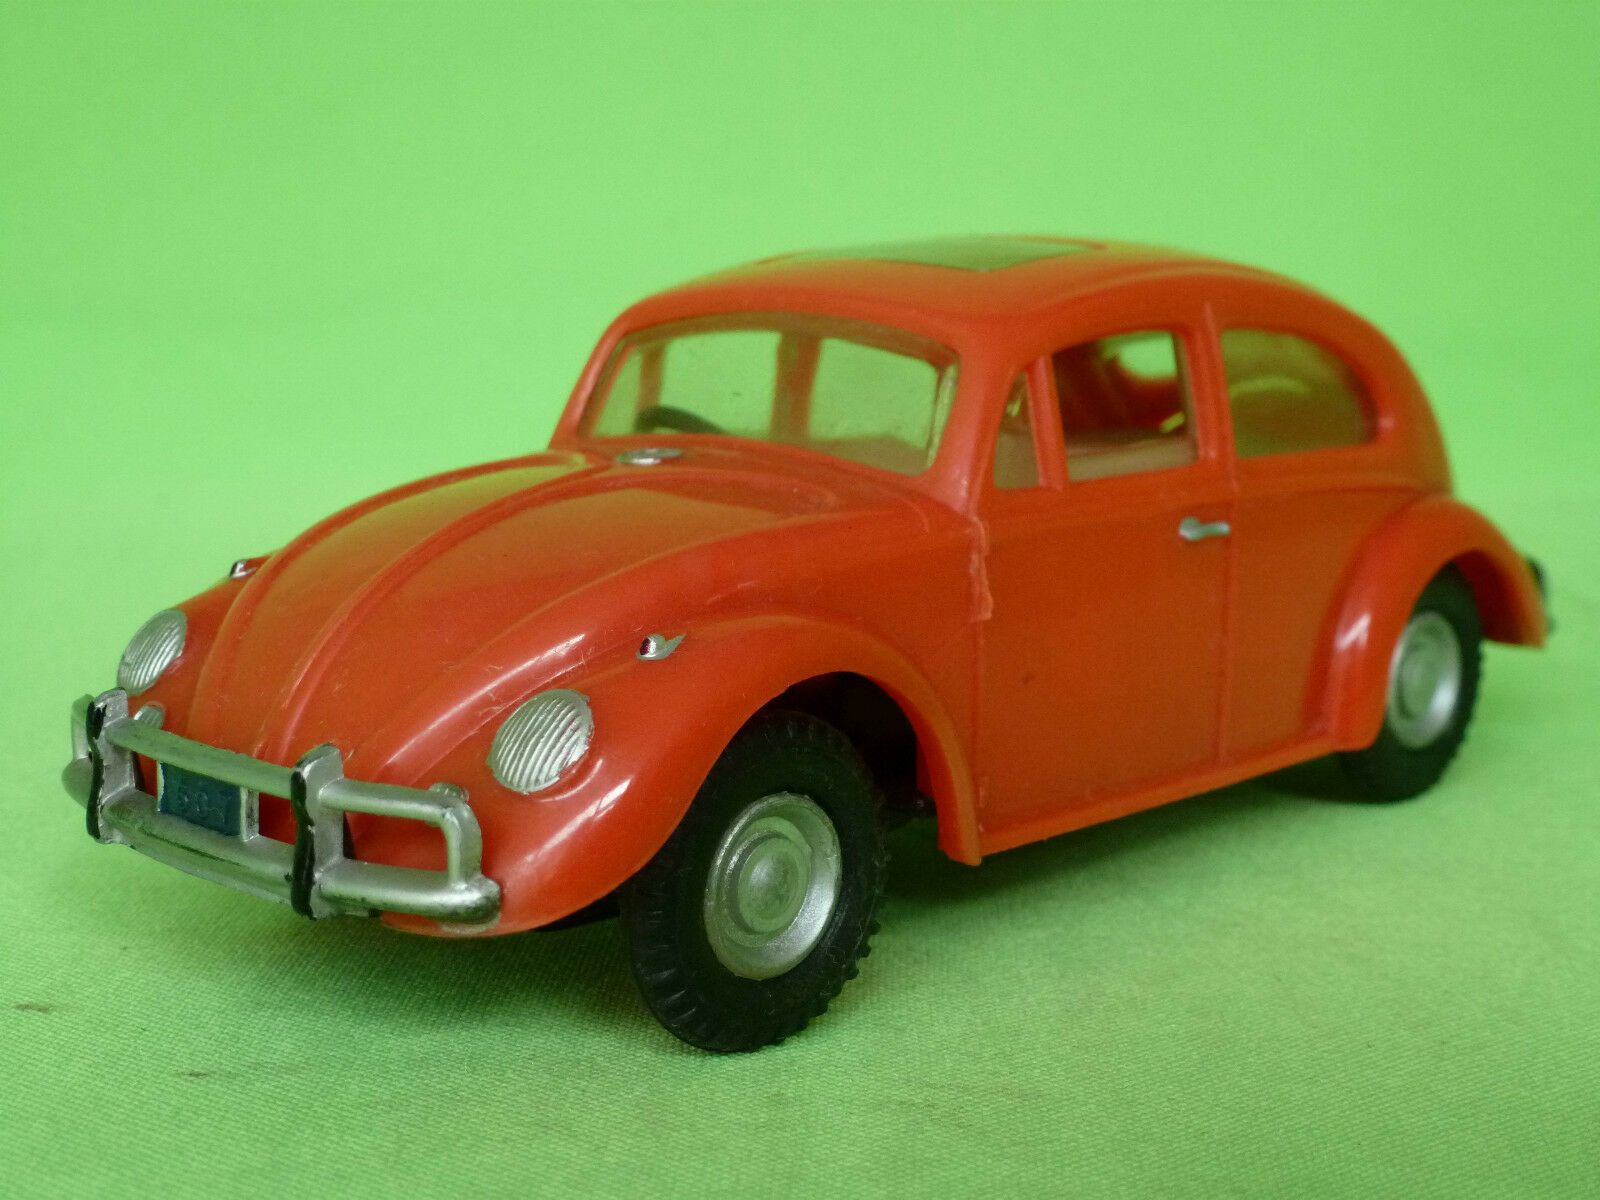 compra nuovo economico CH CH CH 607 VW VOLKSWAGEN rosso - MECHANISM -  RARE SELTEN IN EXCELLENT CONDITION  in vendita online